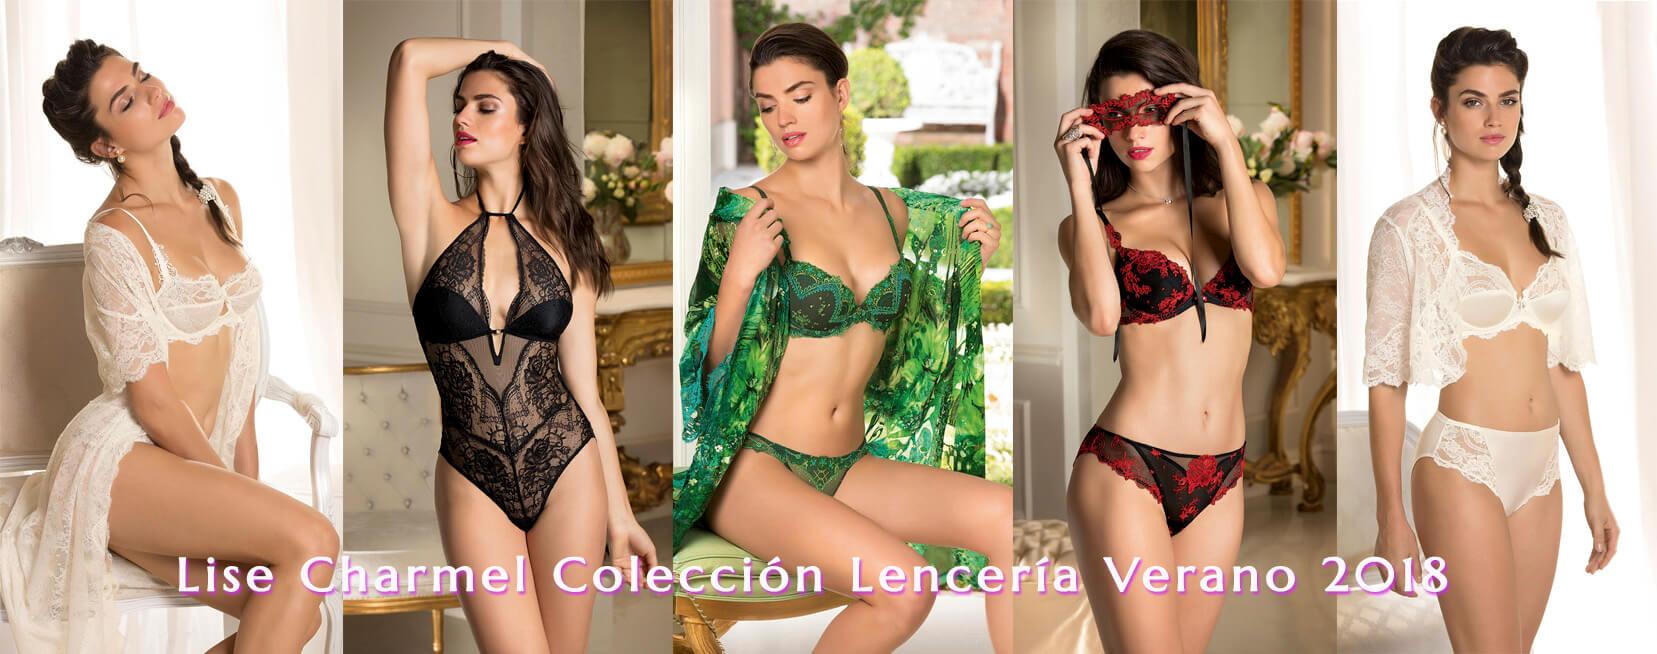 Lise Charmel Lenceria coleccion Verano 2018